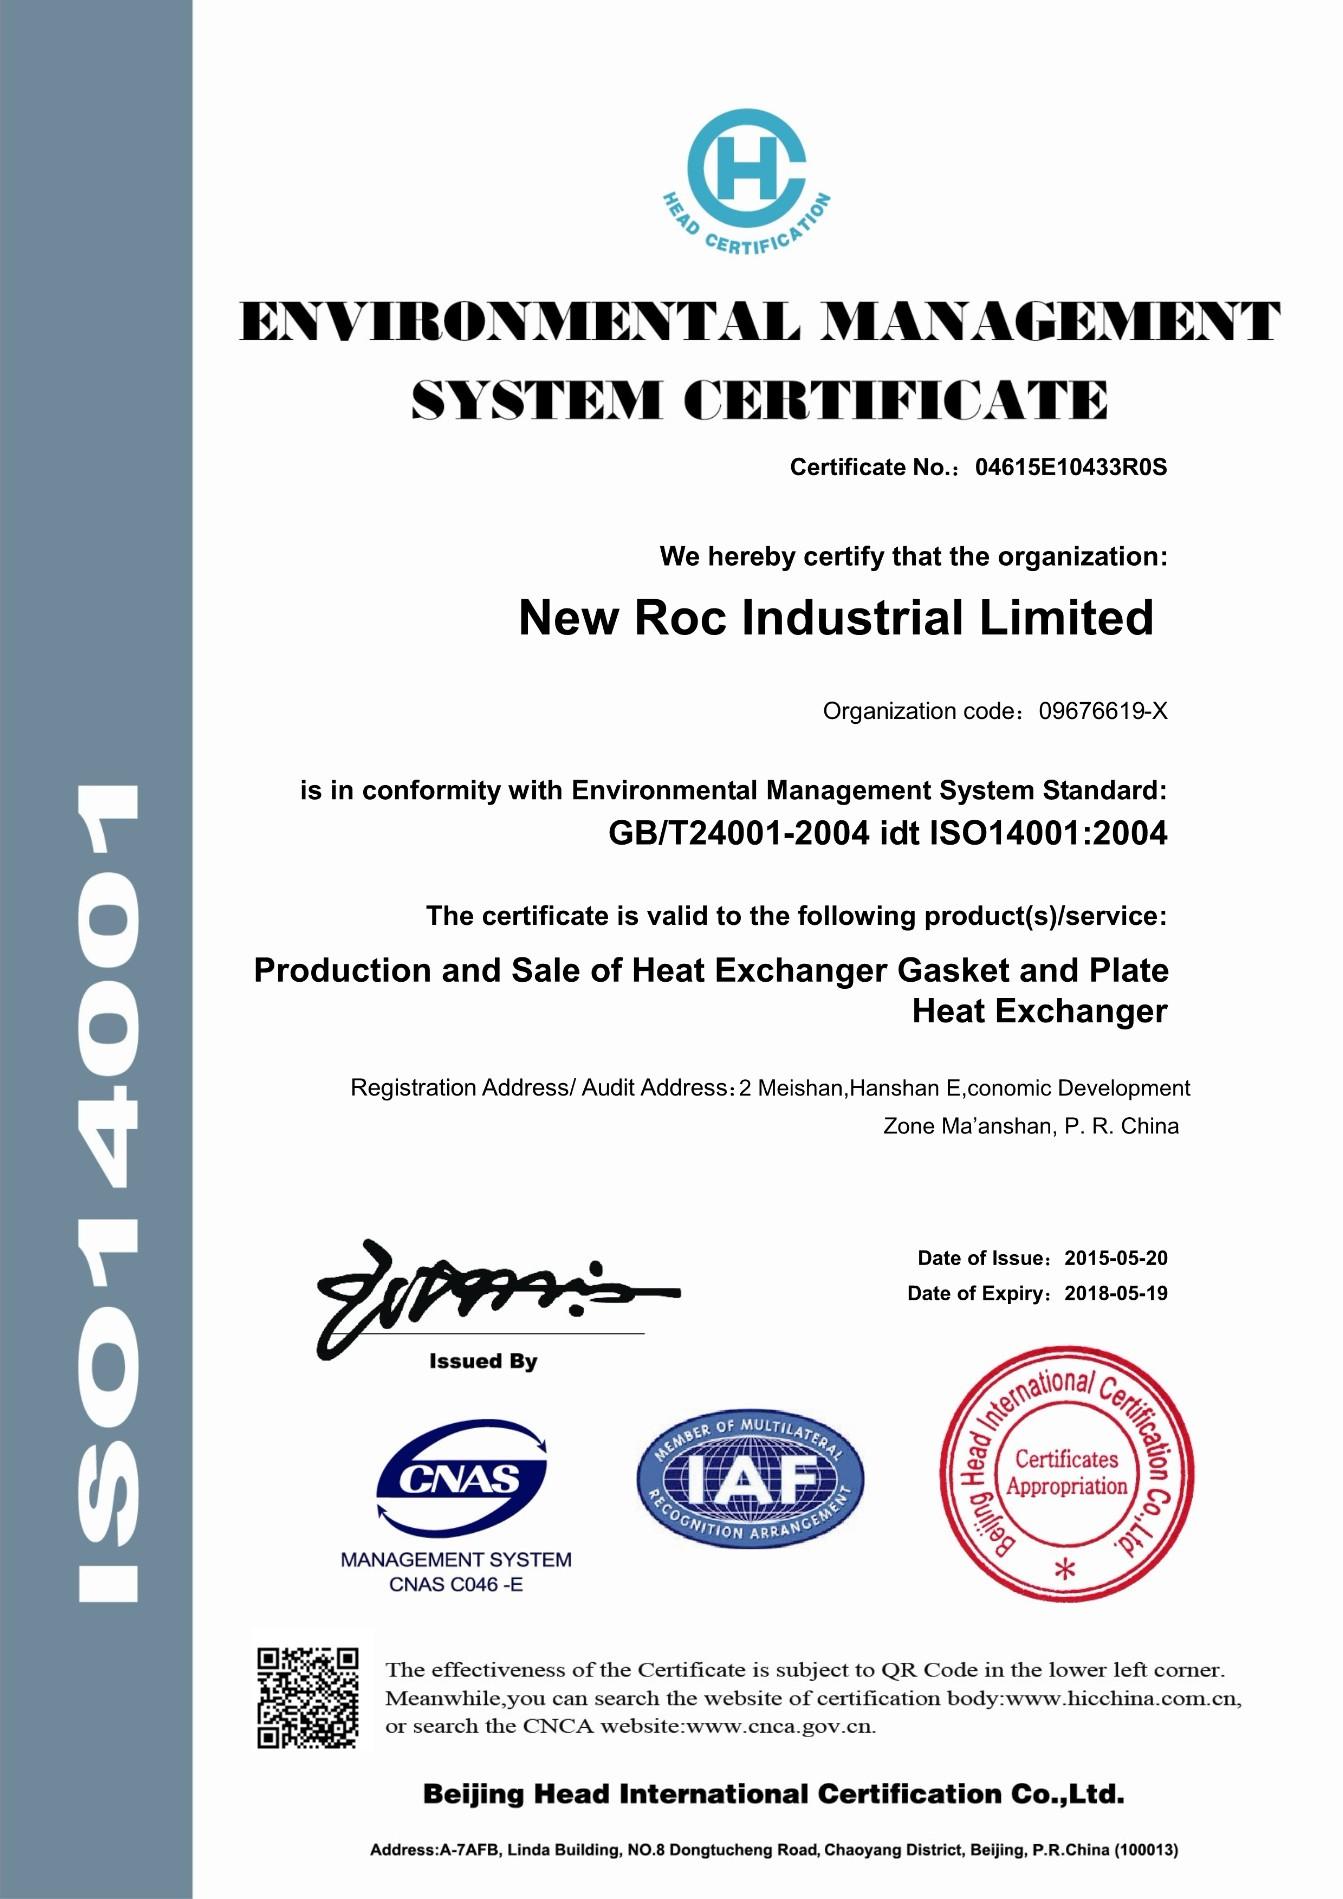 14001 certification